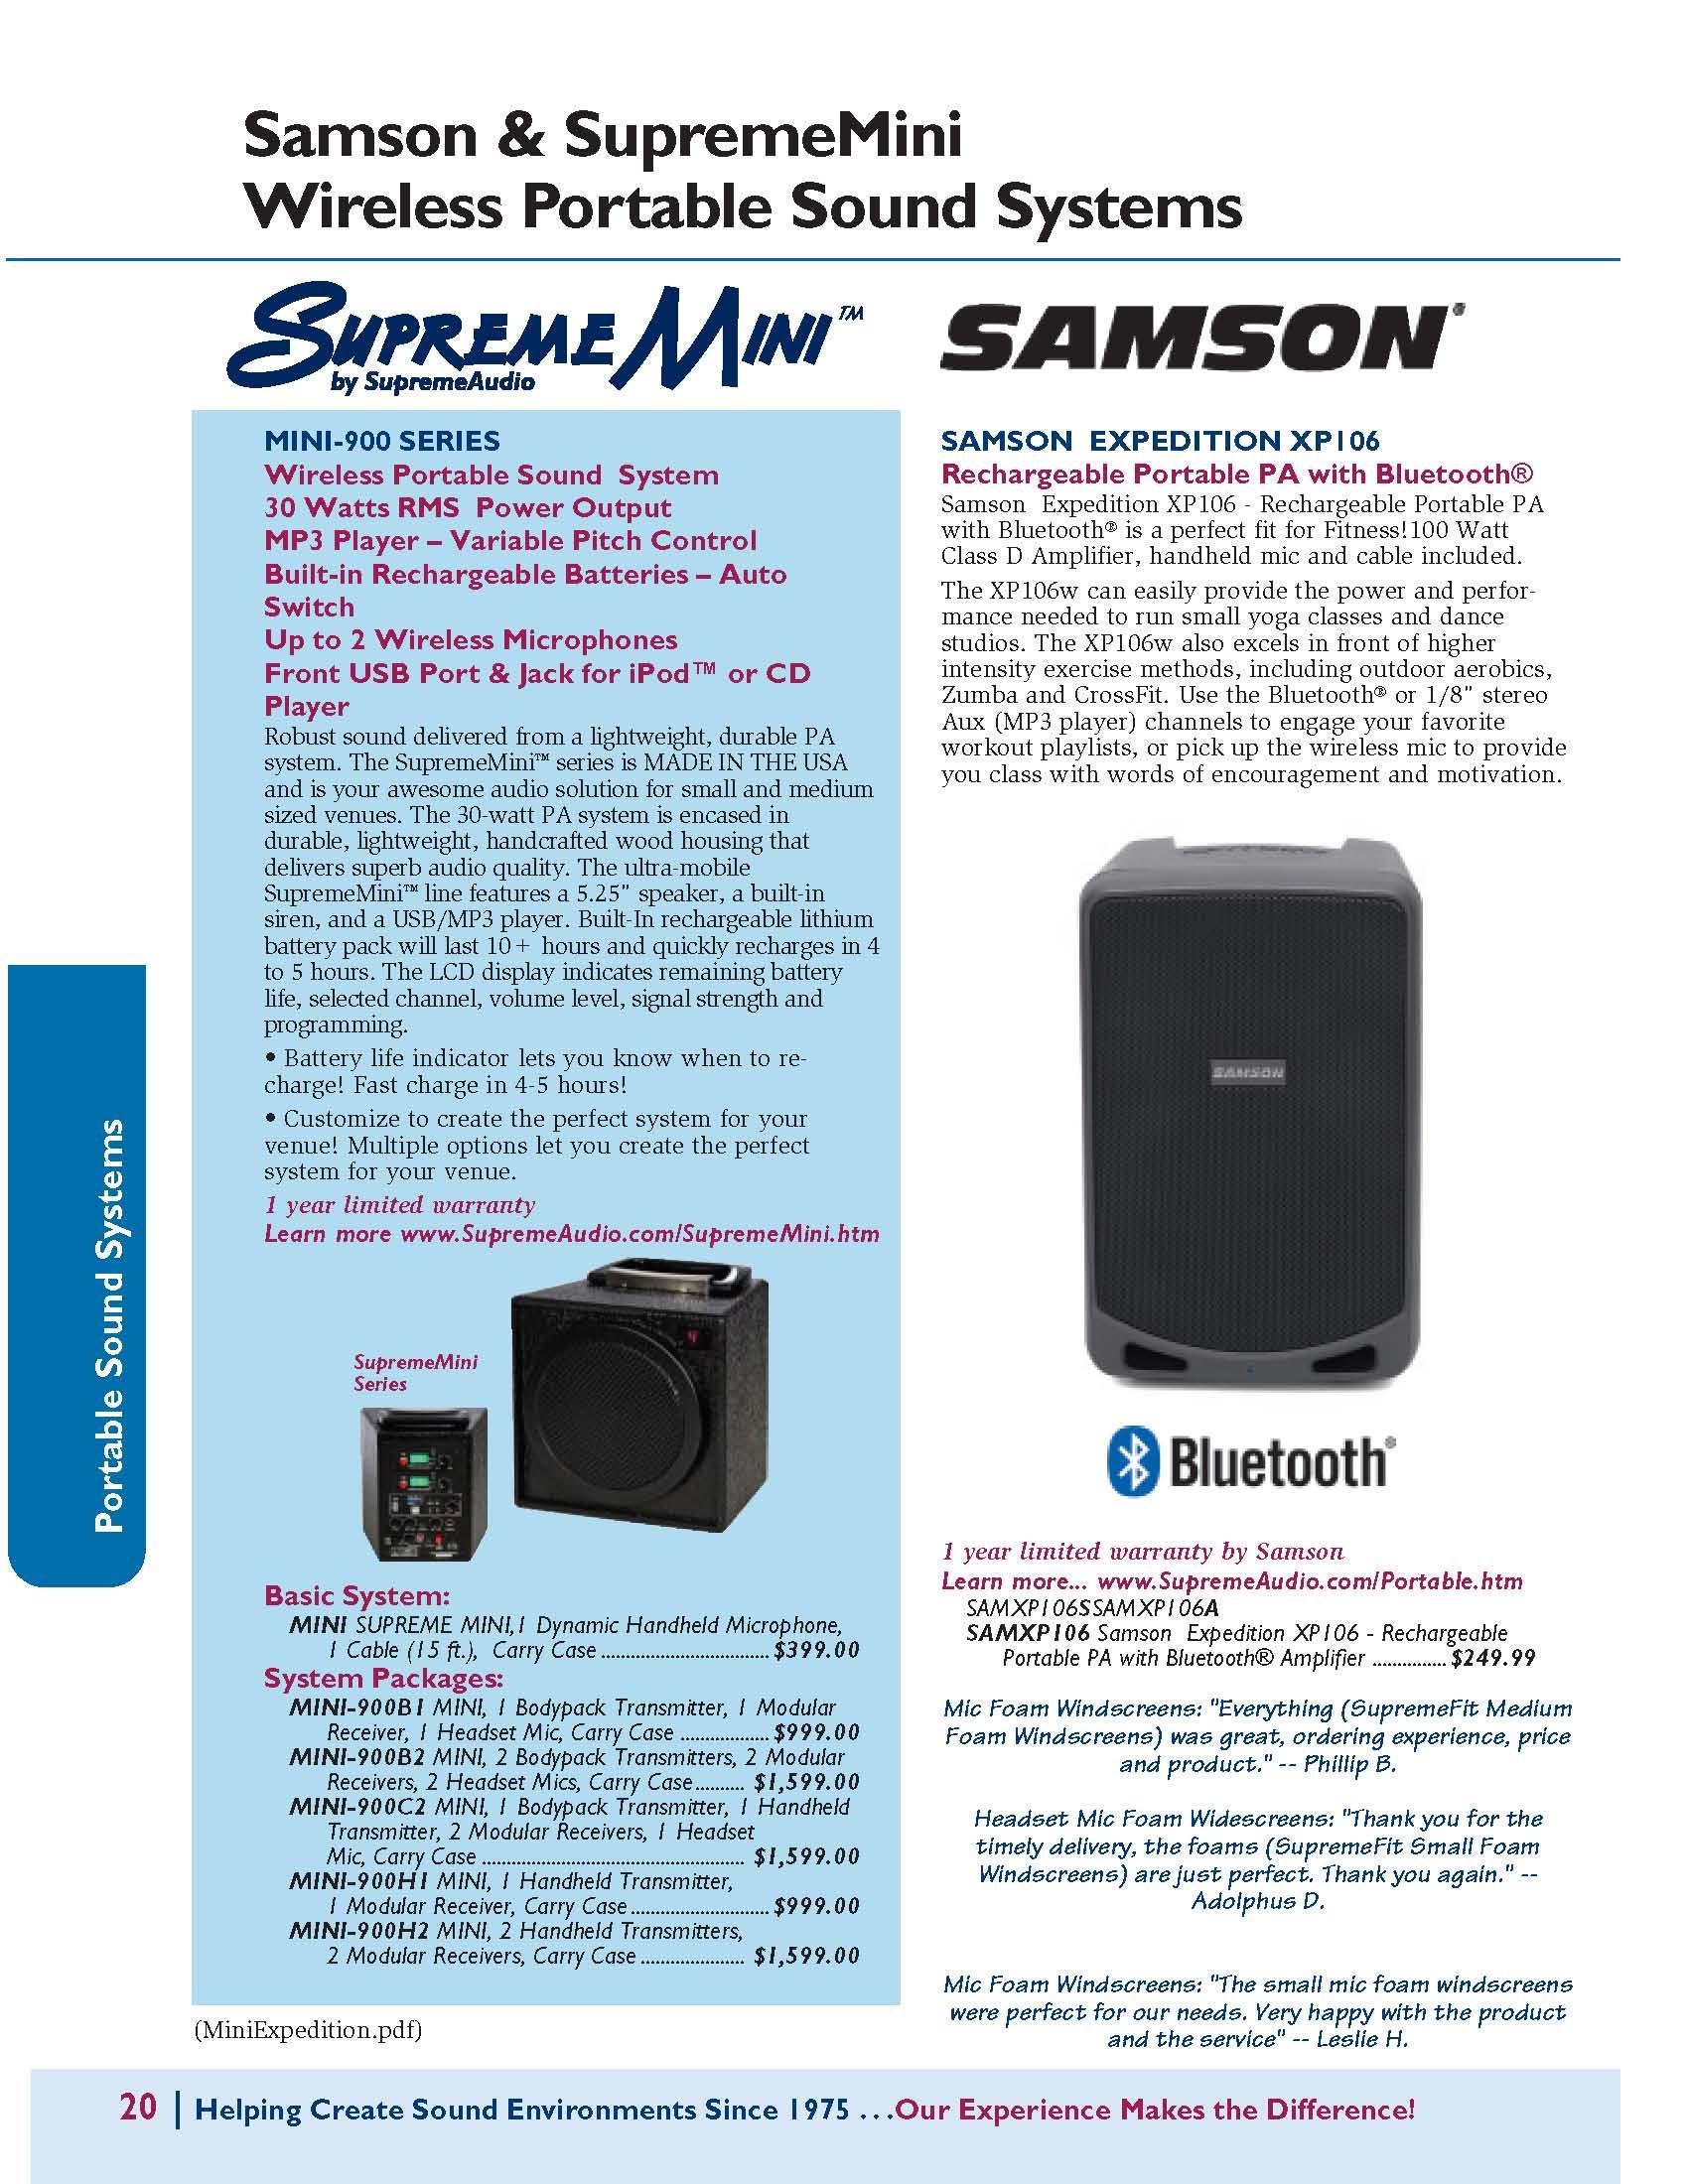 Samson Expedition Bluetooth & SupremeMini Portable Sound Systems